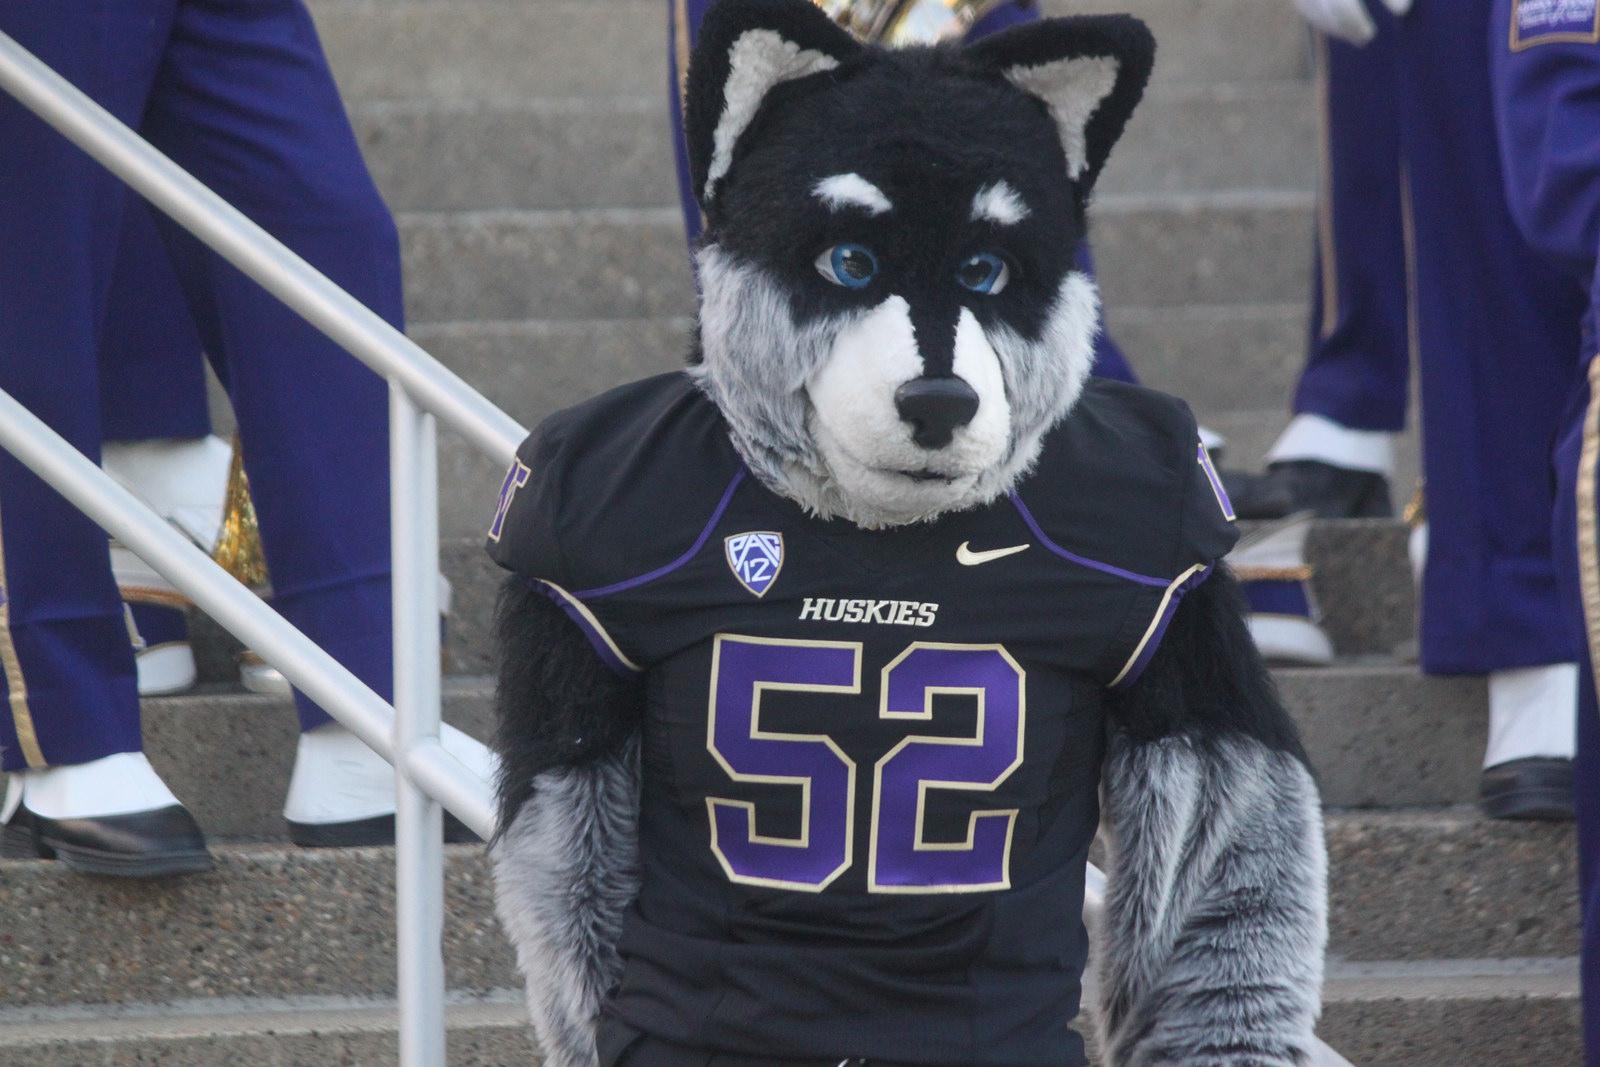 Washington Huskies mascot Harry the Husky